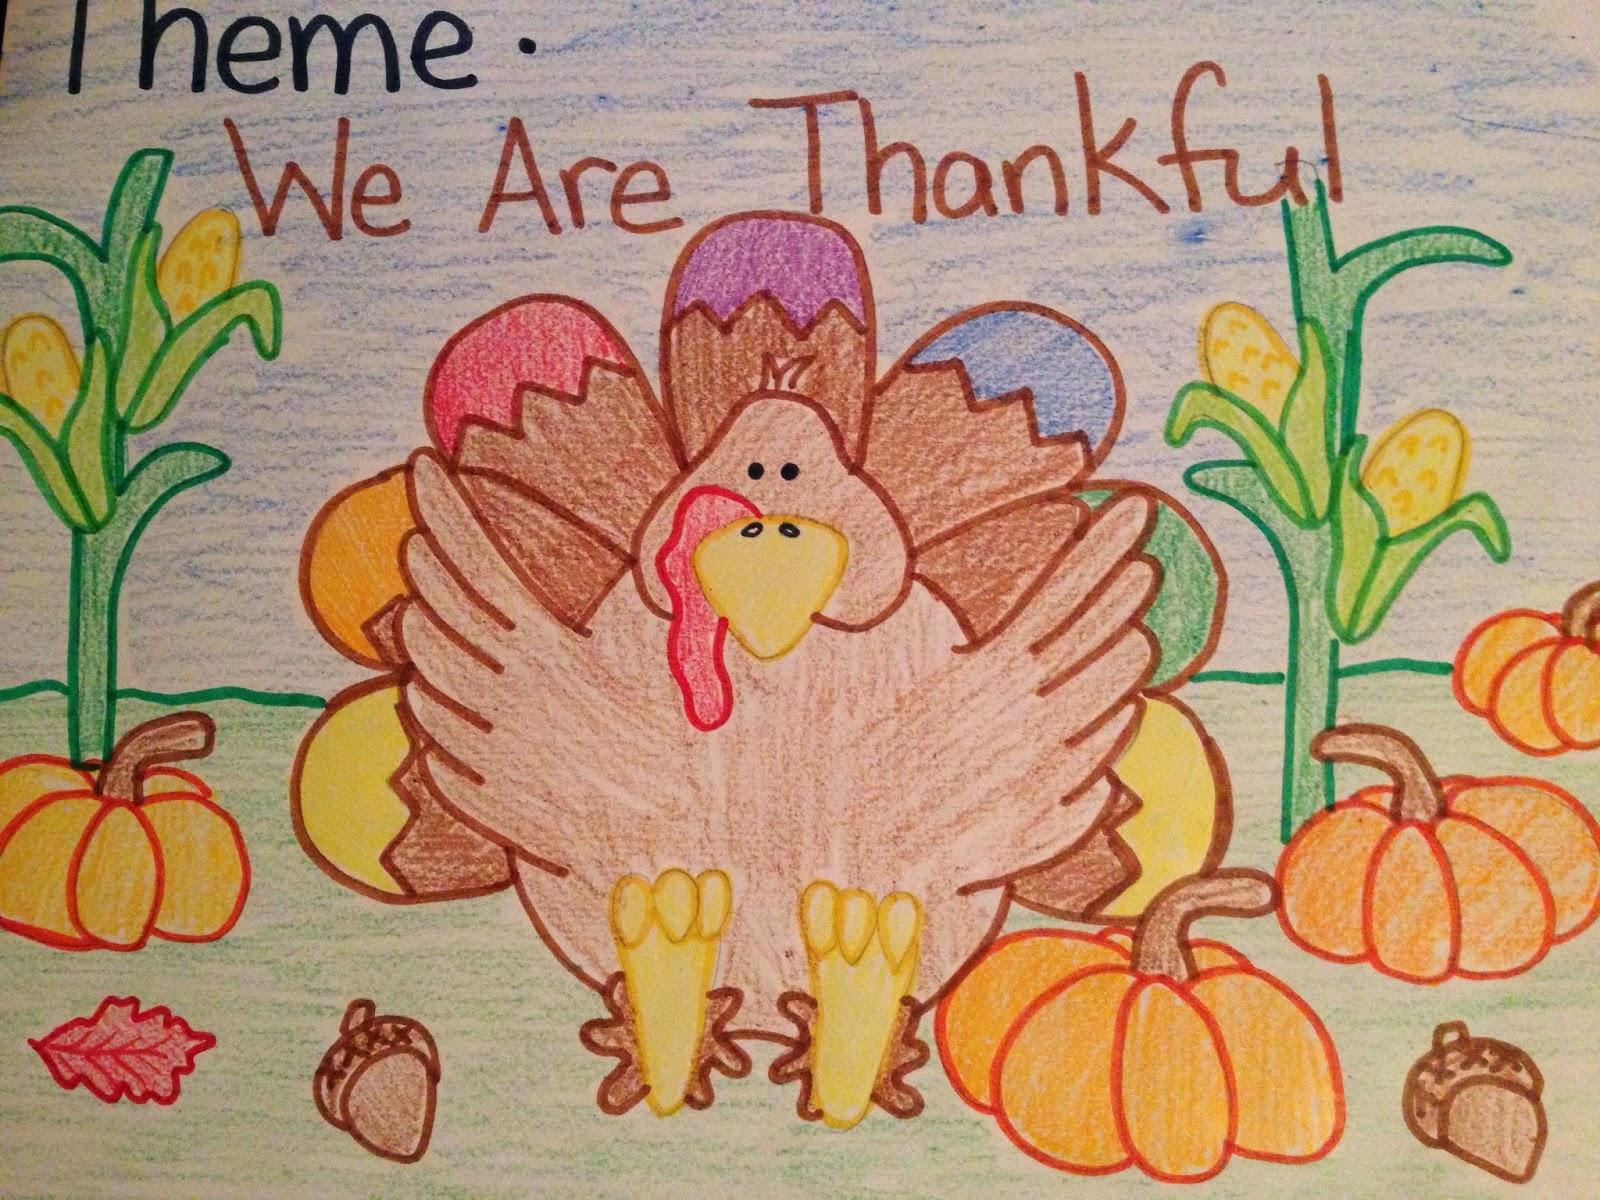 Keep Calm And Teach On We Are Thankful